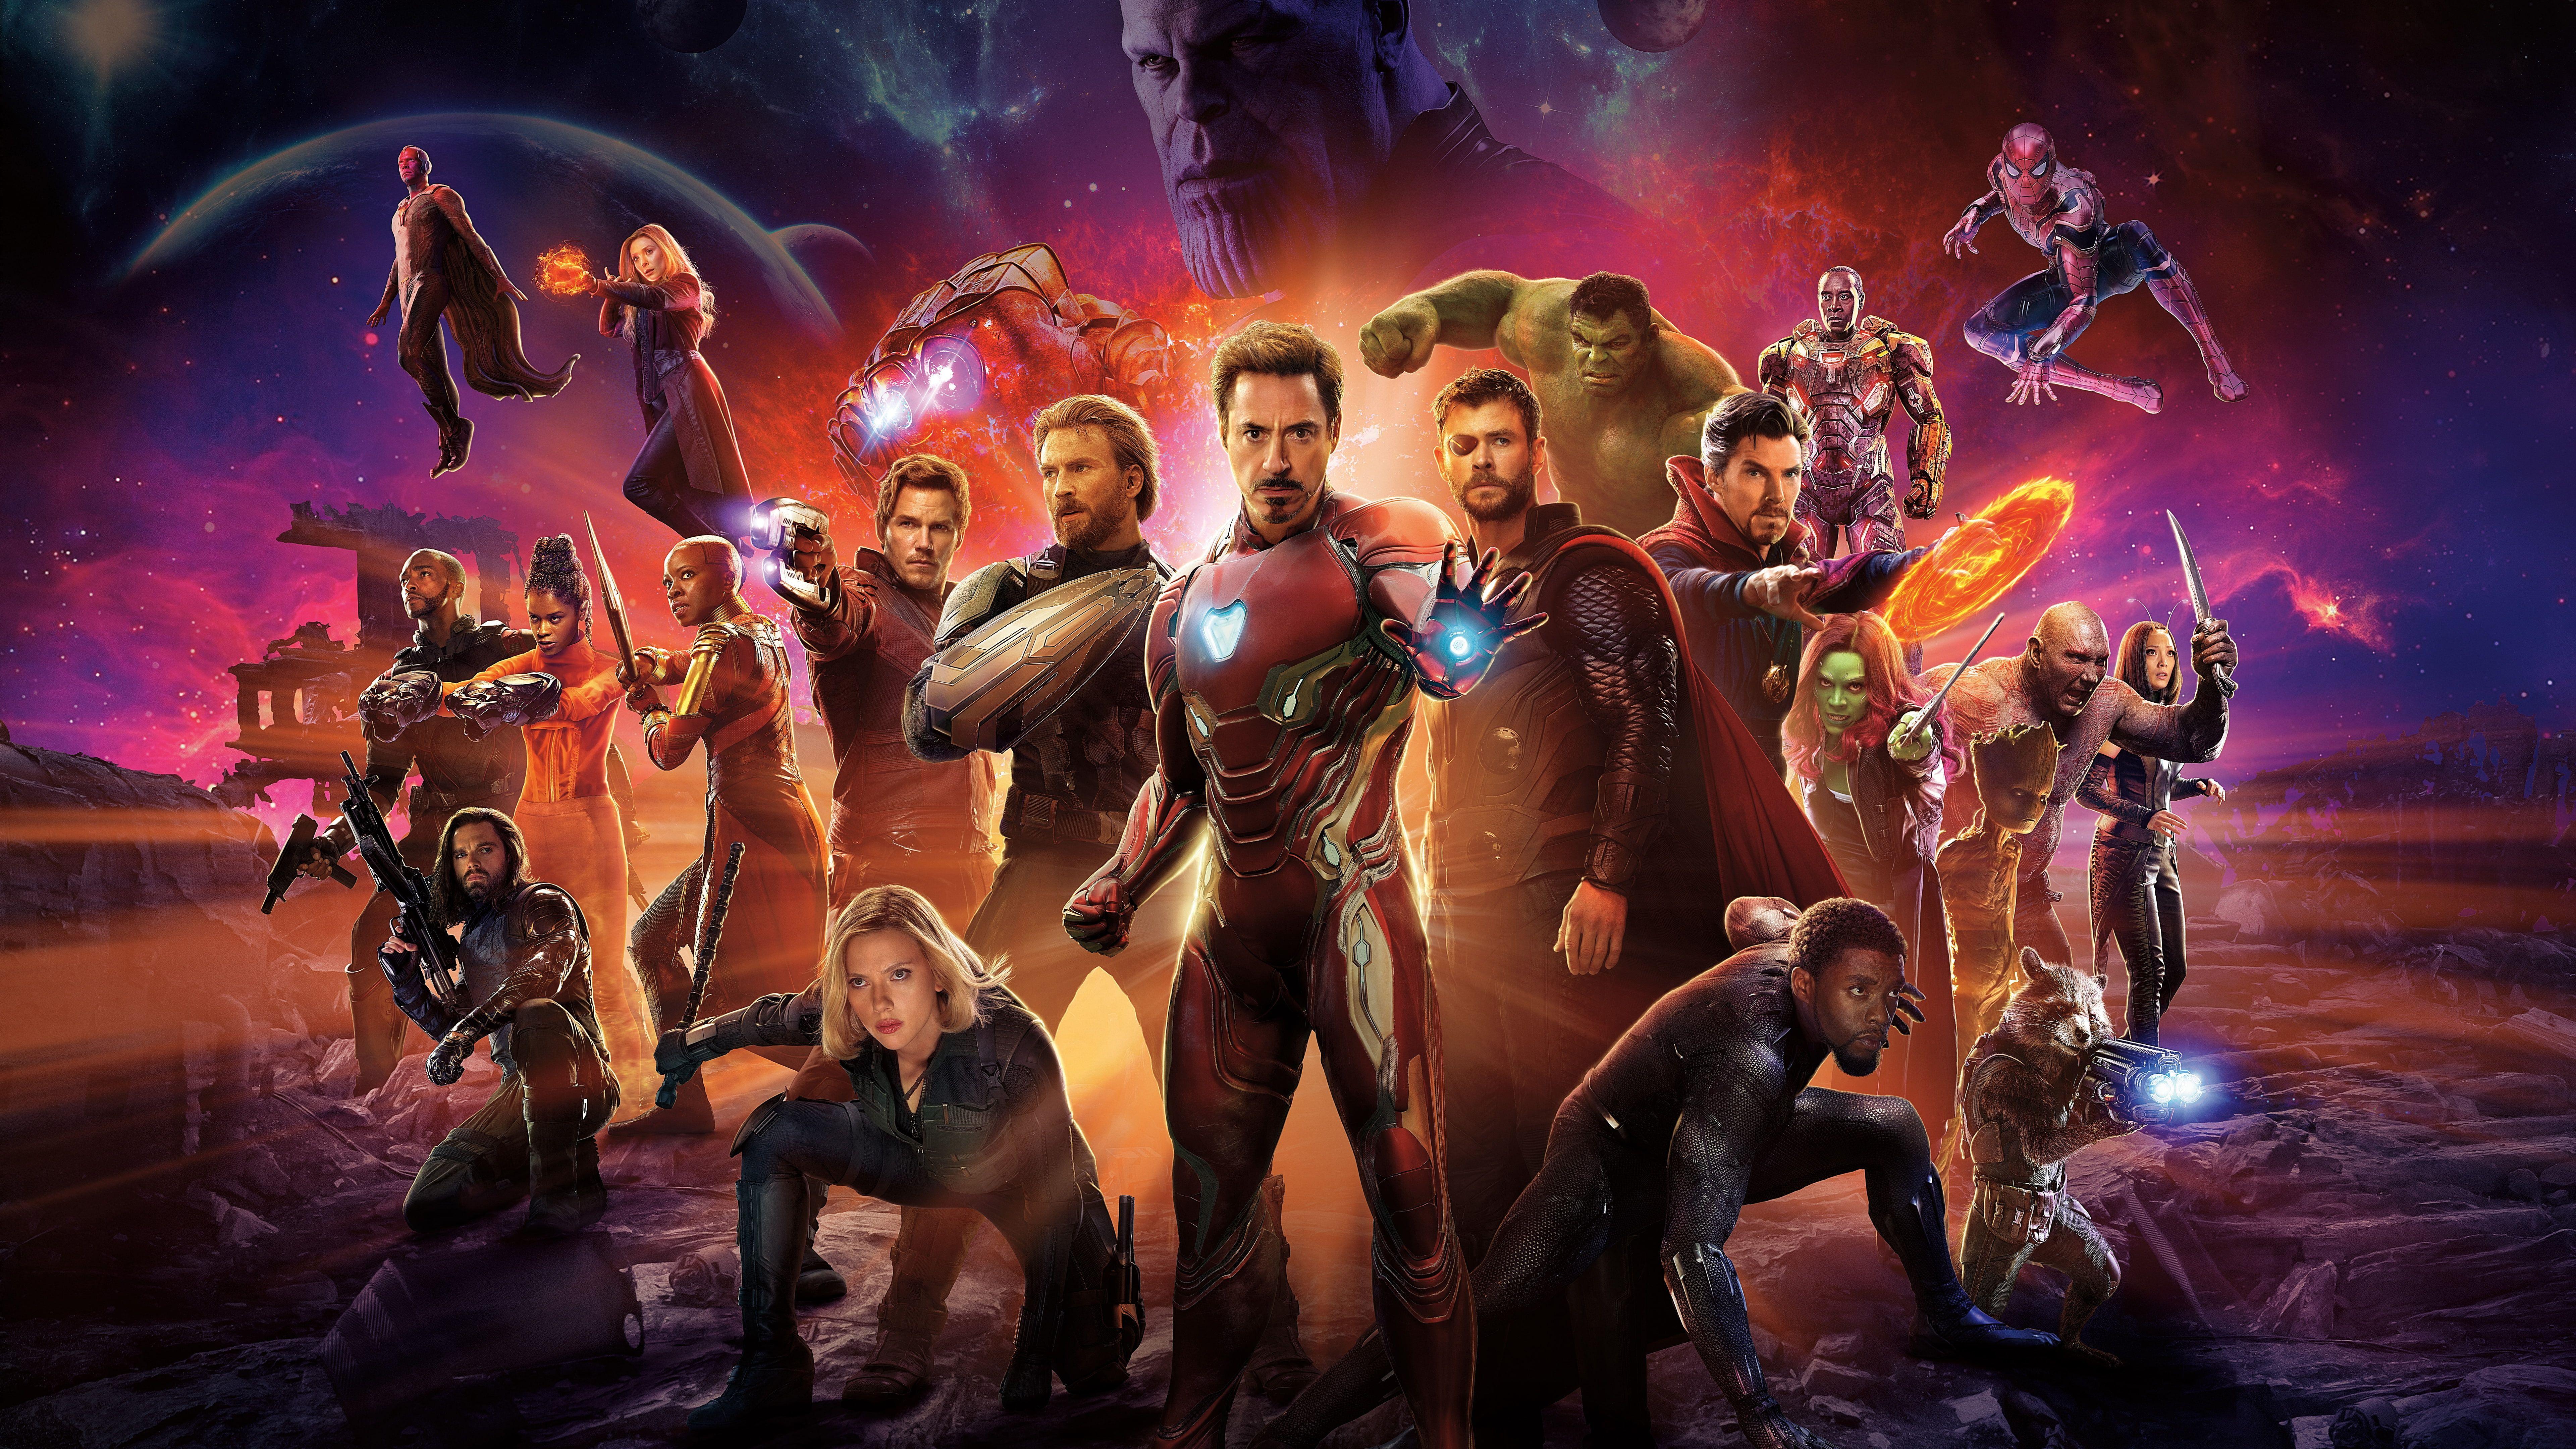 Avengers Infinity War Superheroes Cast 4k 8k Cast Infinity Avengers Superheroes War 8k Wallpaper Hdwal In 2020 All Marvel Movies Avengers Avengers Infinity War